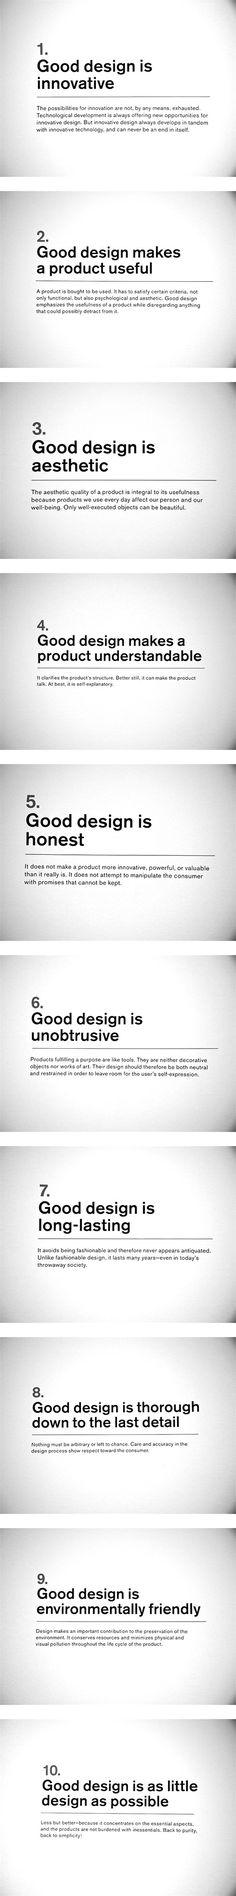 "Dieter Rams' ""Ten principles for Good Design"". If you like UX, design, or design… Visual Design, Ux Design, Tool Design, Design Process, Layout Design, Branding Design, Life Design, Design Thinking, Lettering"